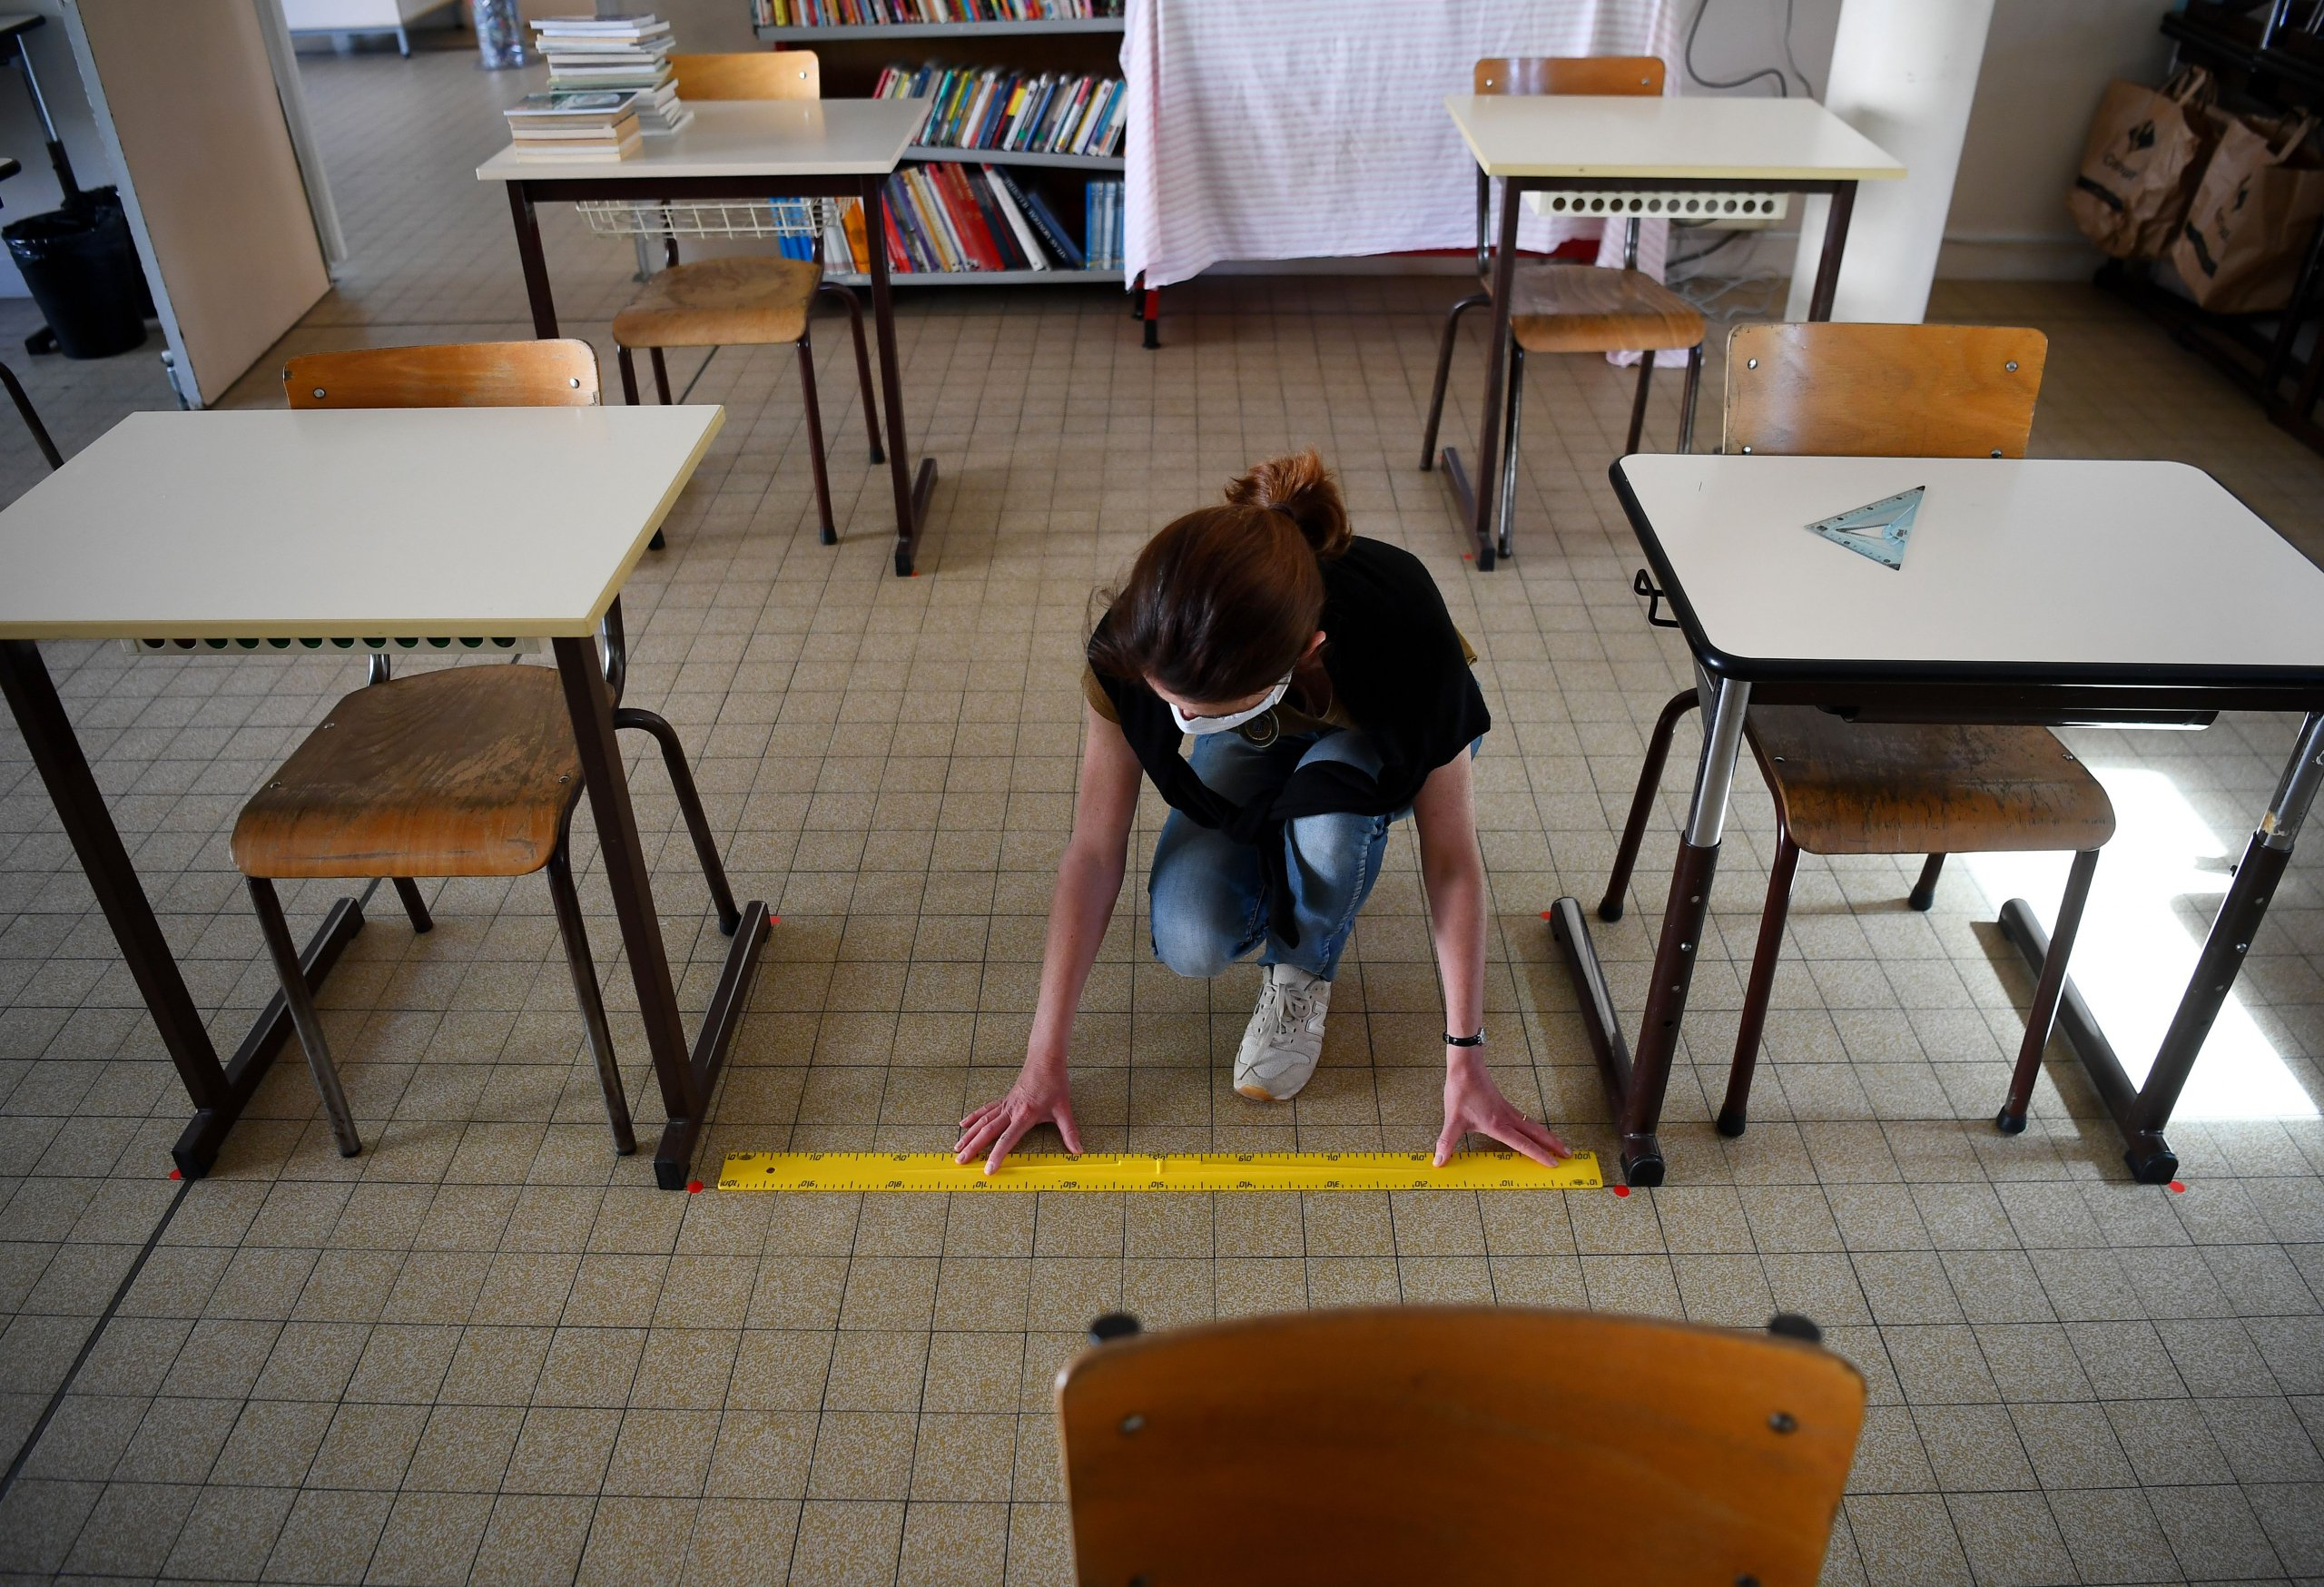 FRANCE-HEALTH-VIRUS-SCHOOL